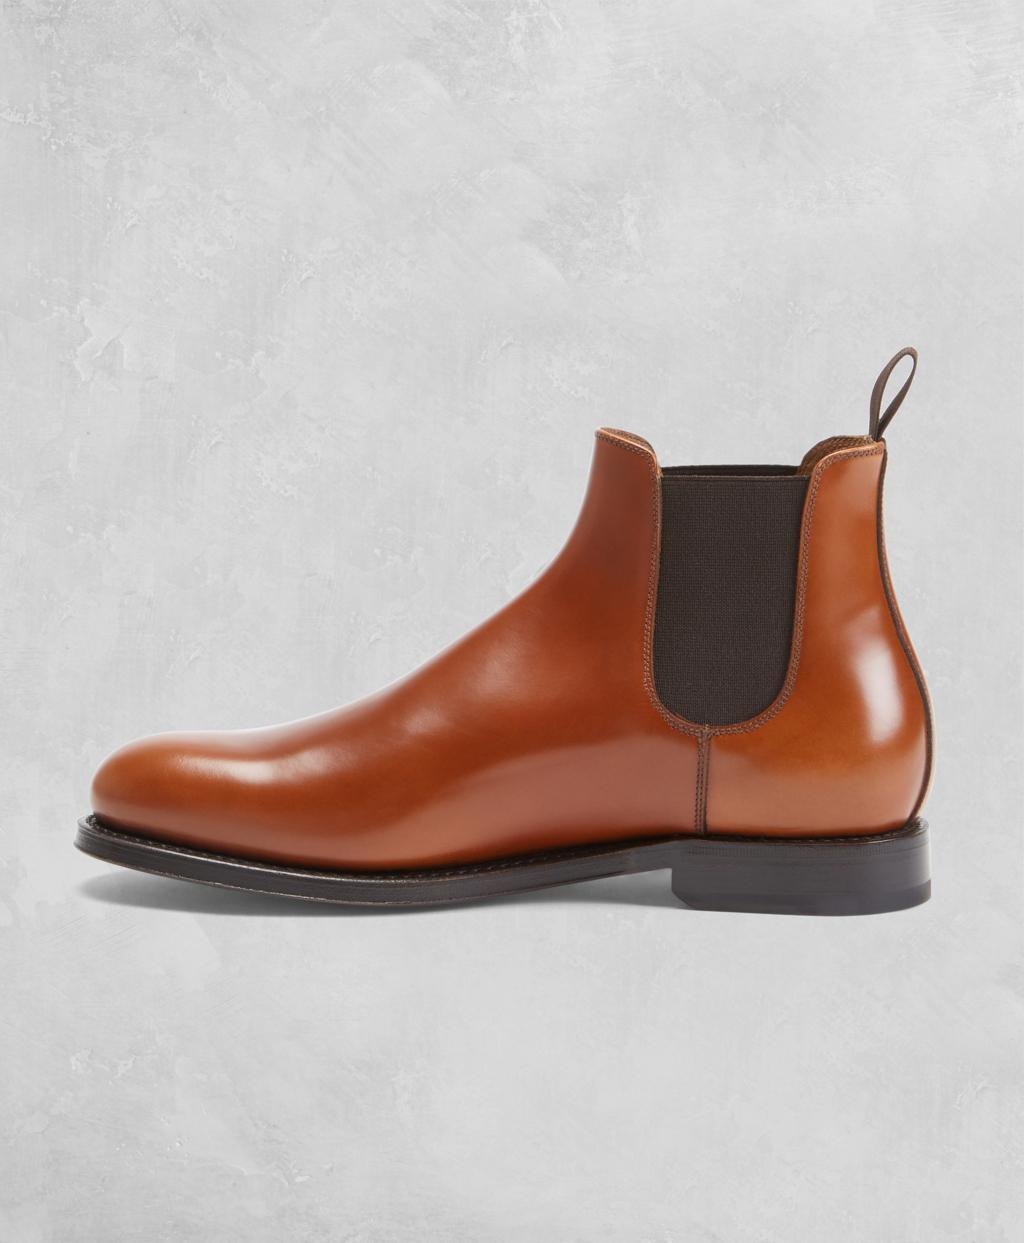 97fbf2baf67 Lyst - Brooks Brothers Golden Fleece Chelsea Boots in Brown for Men